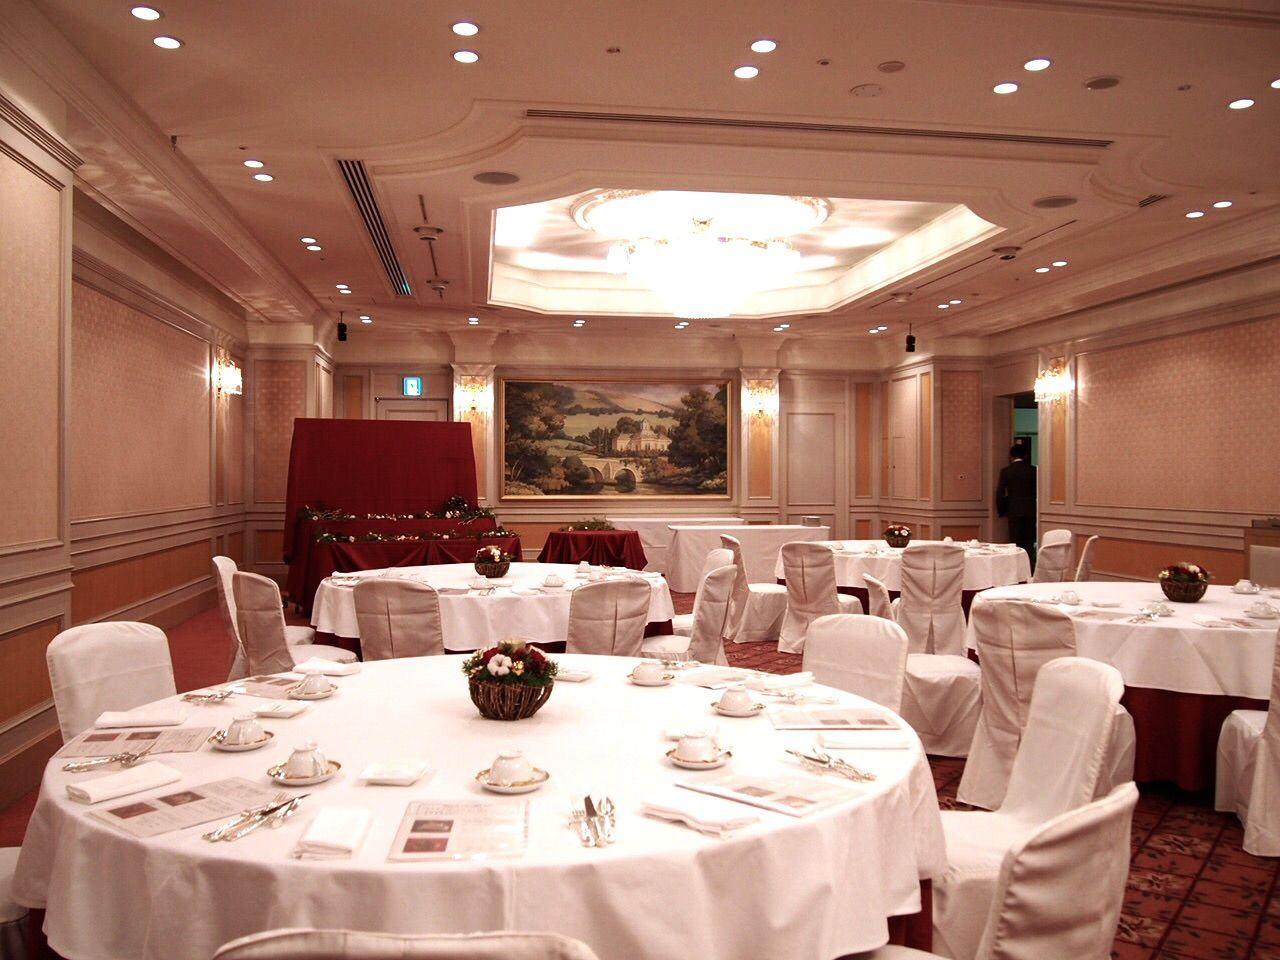 Imperial Hotel Osaka – Banquet Hall